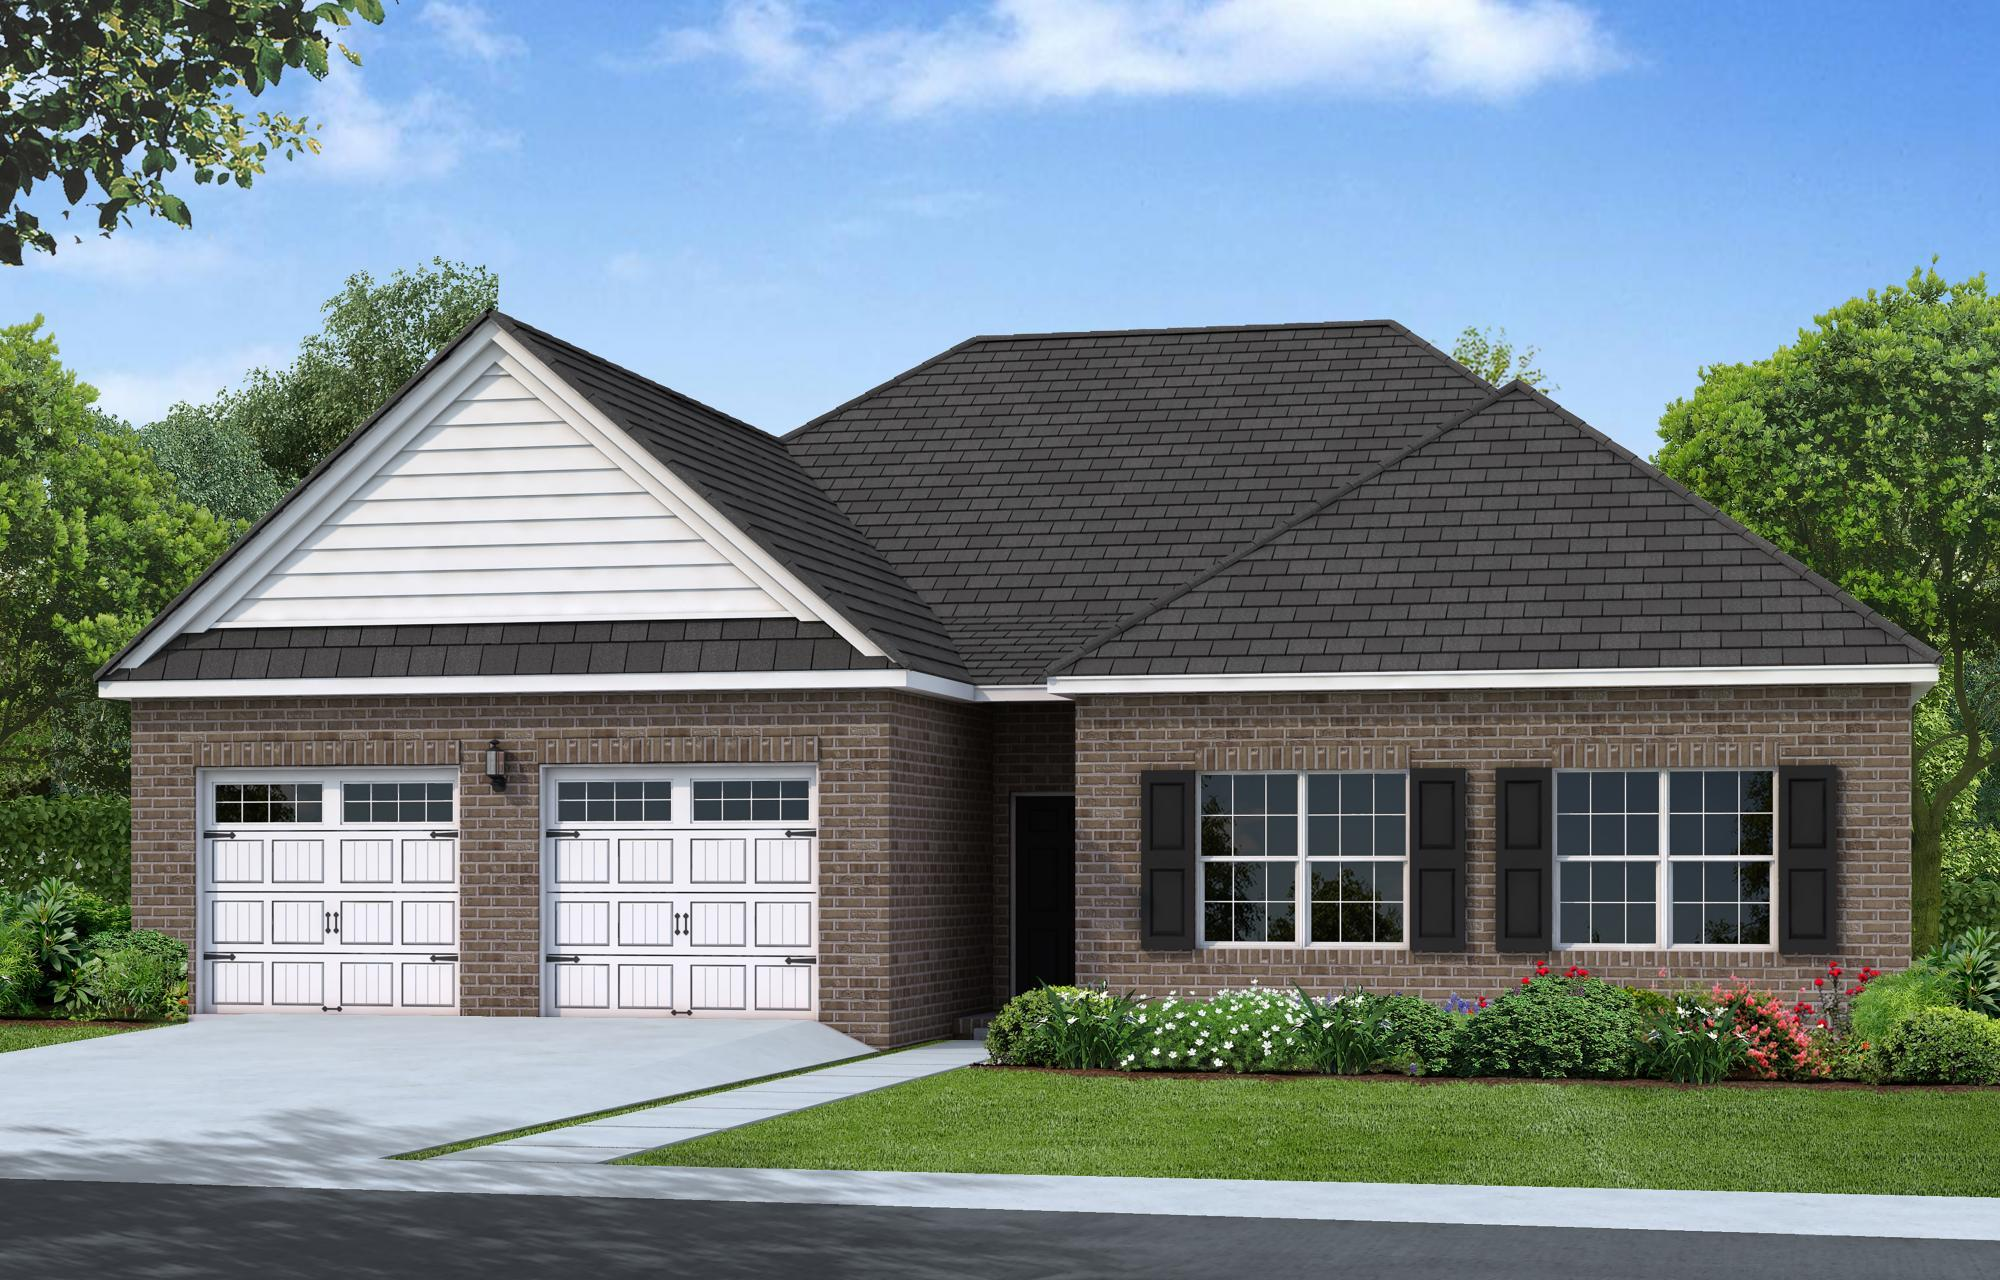 1012 Kirkwood Drive. #CF72, Gallatin, TN 37066 - Gallatin, TN real estate listing